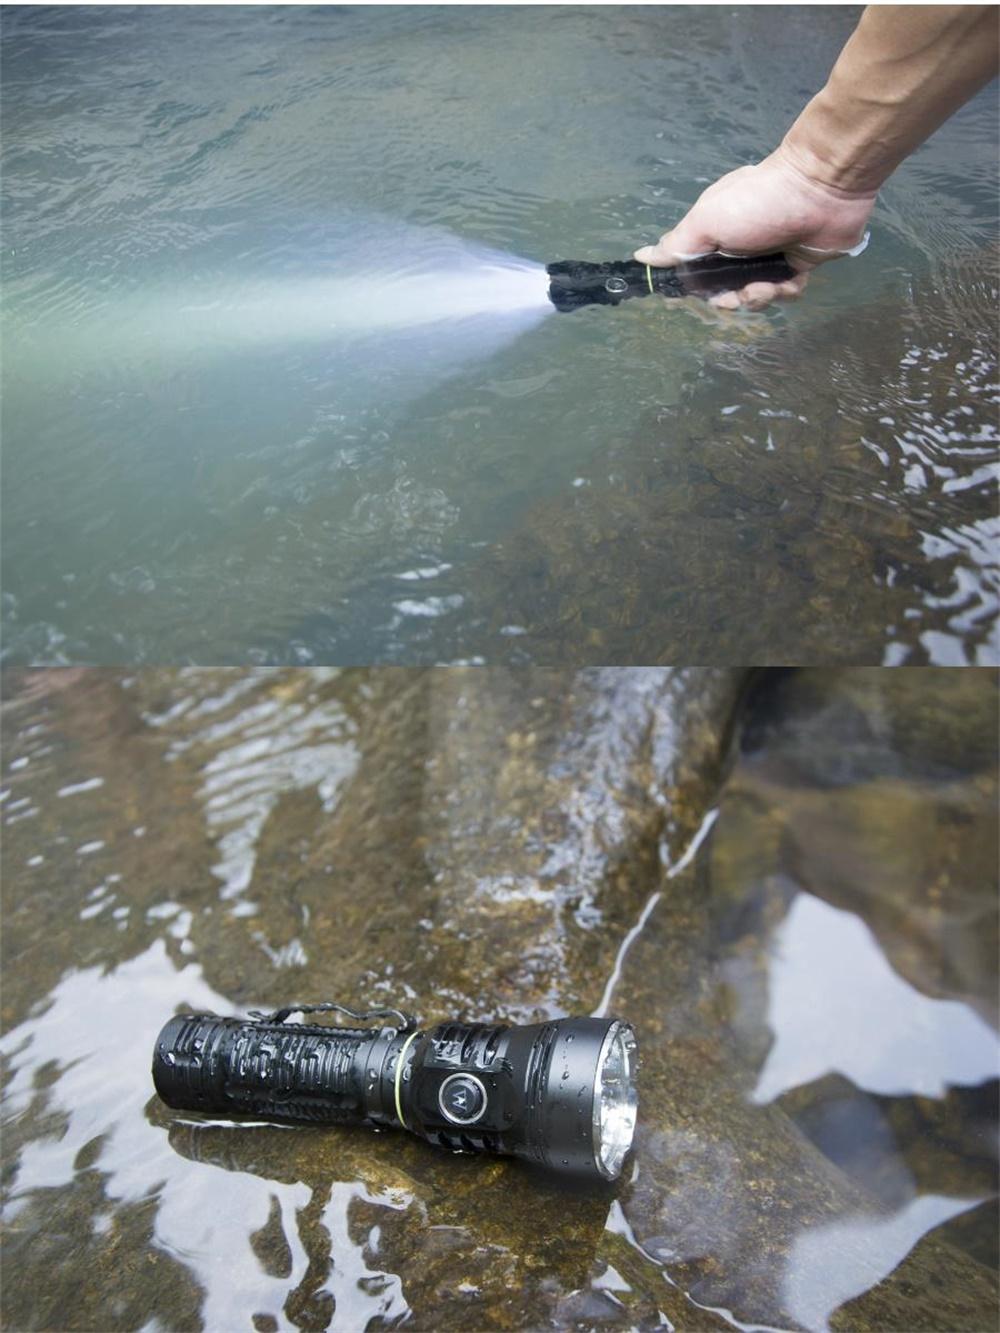 wuben a21 searching flashlight